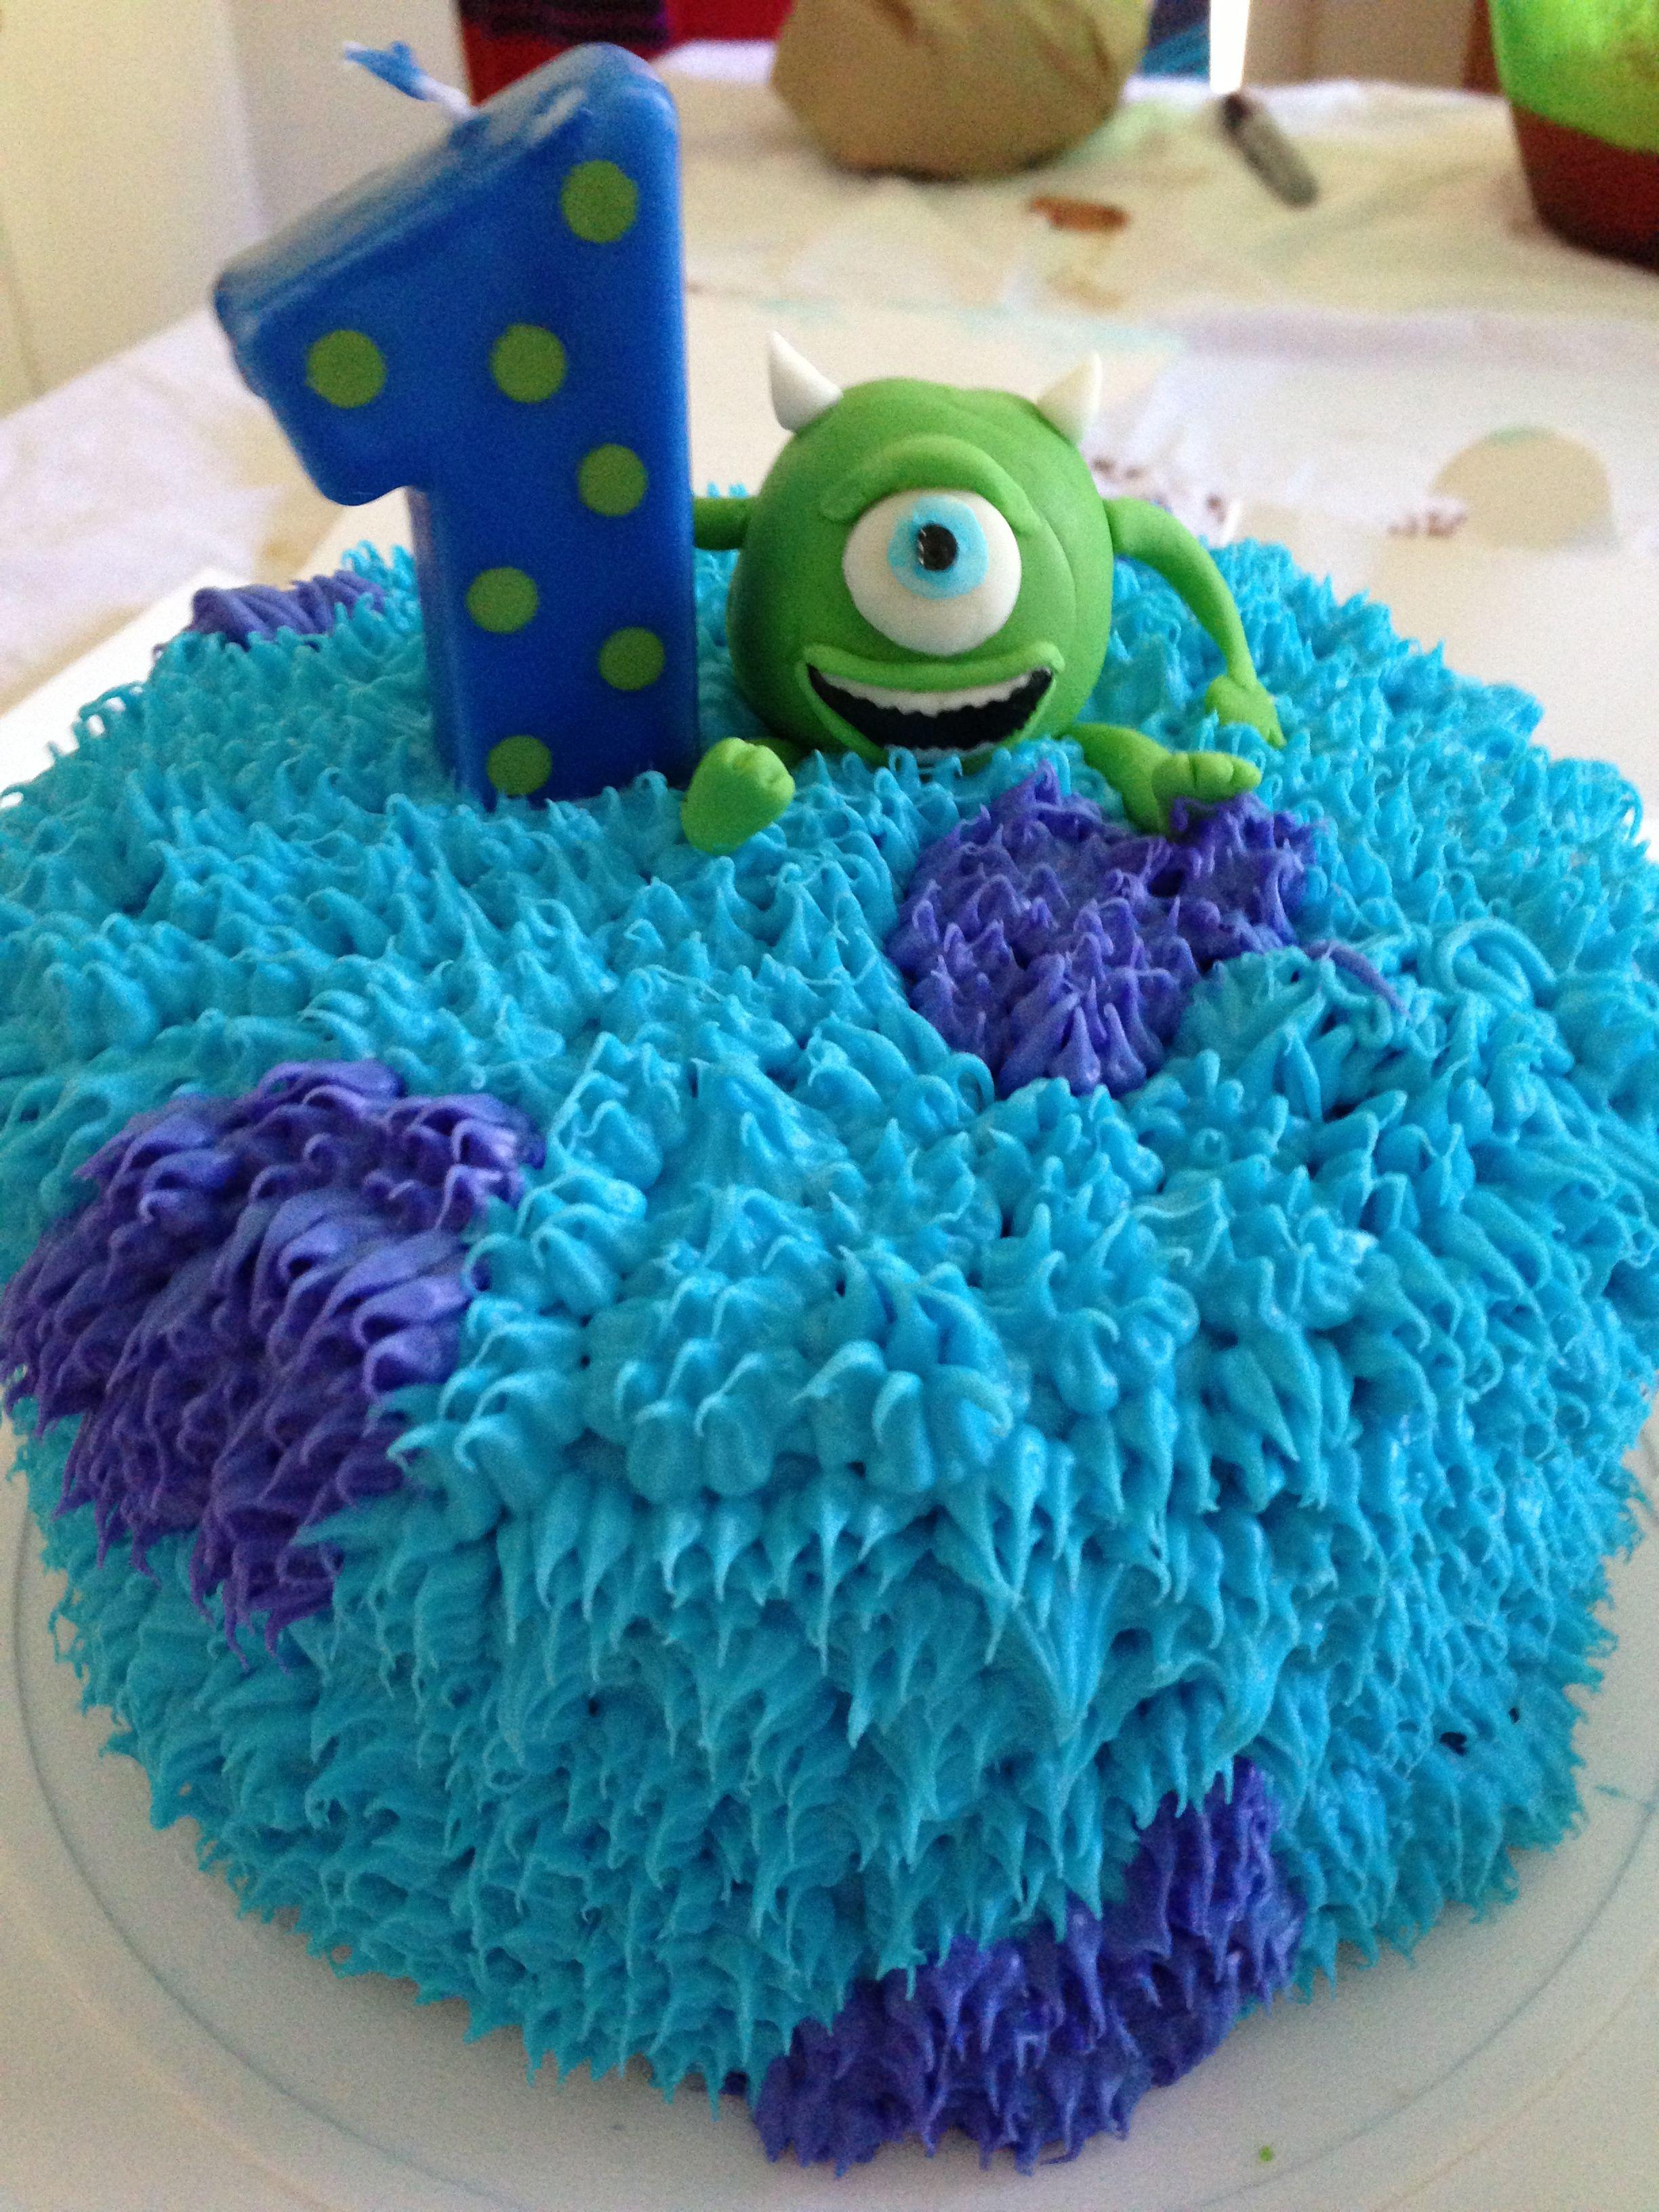 Tremendous Traviss First Birthday Cake Monsters Inc Birthday Cake Funny Birthday Cards Online Kookostrdamsfinfo